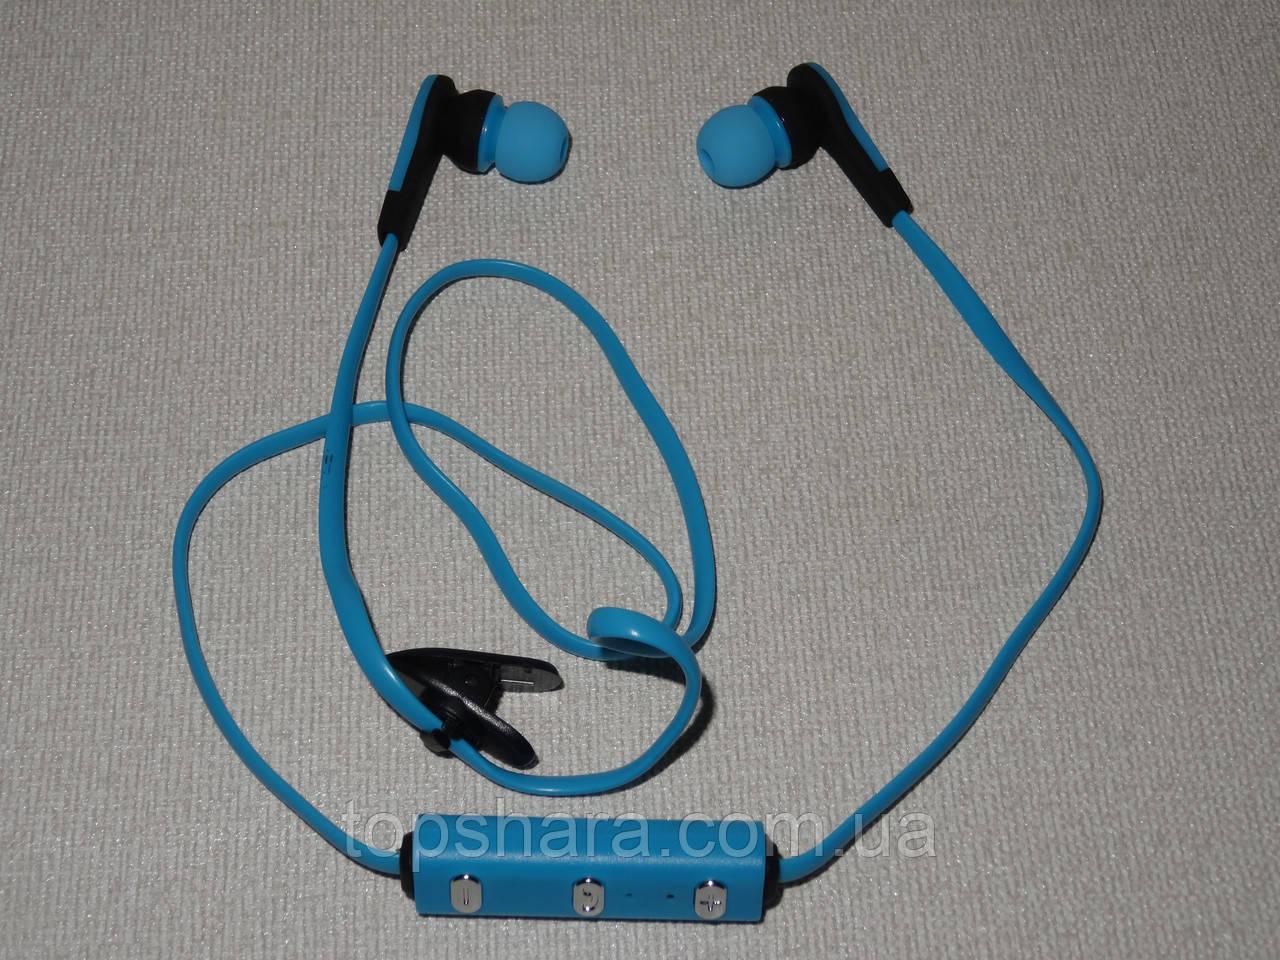 Наушники гарнитура Bluetooth sport Nike MS-B4 синие